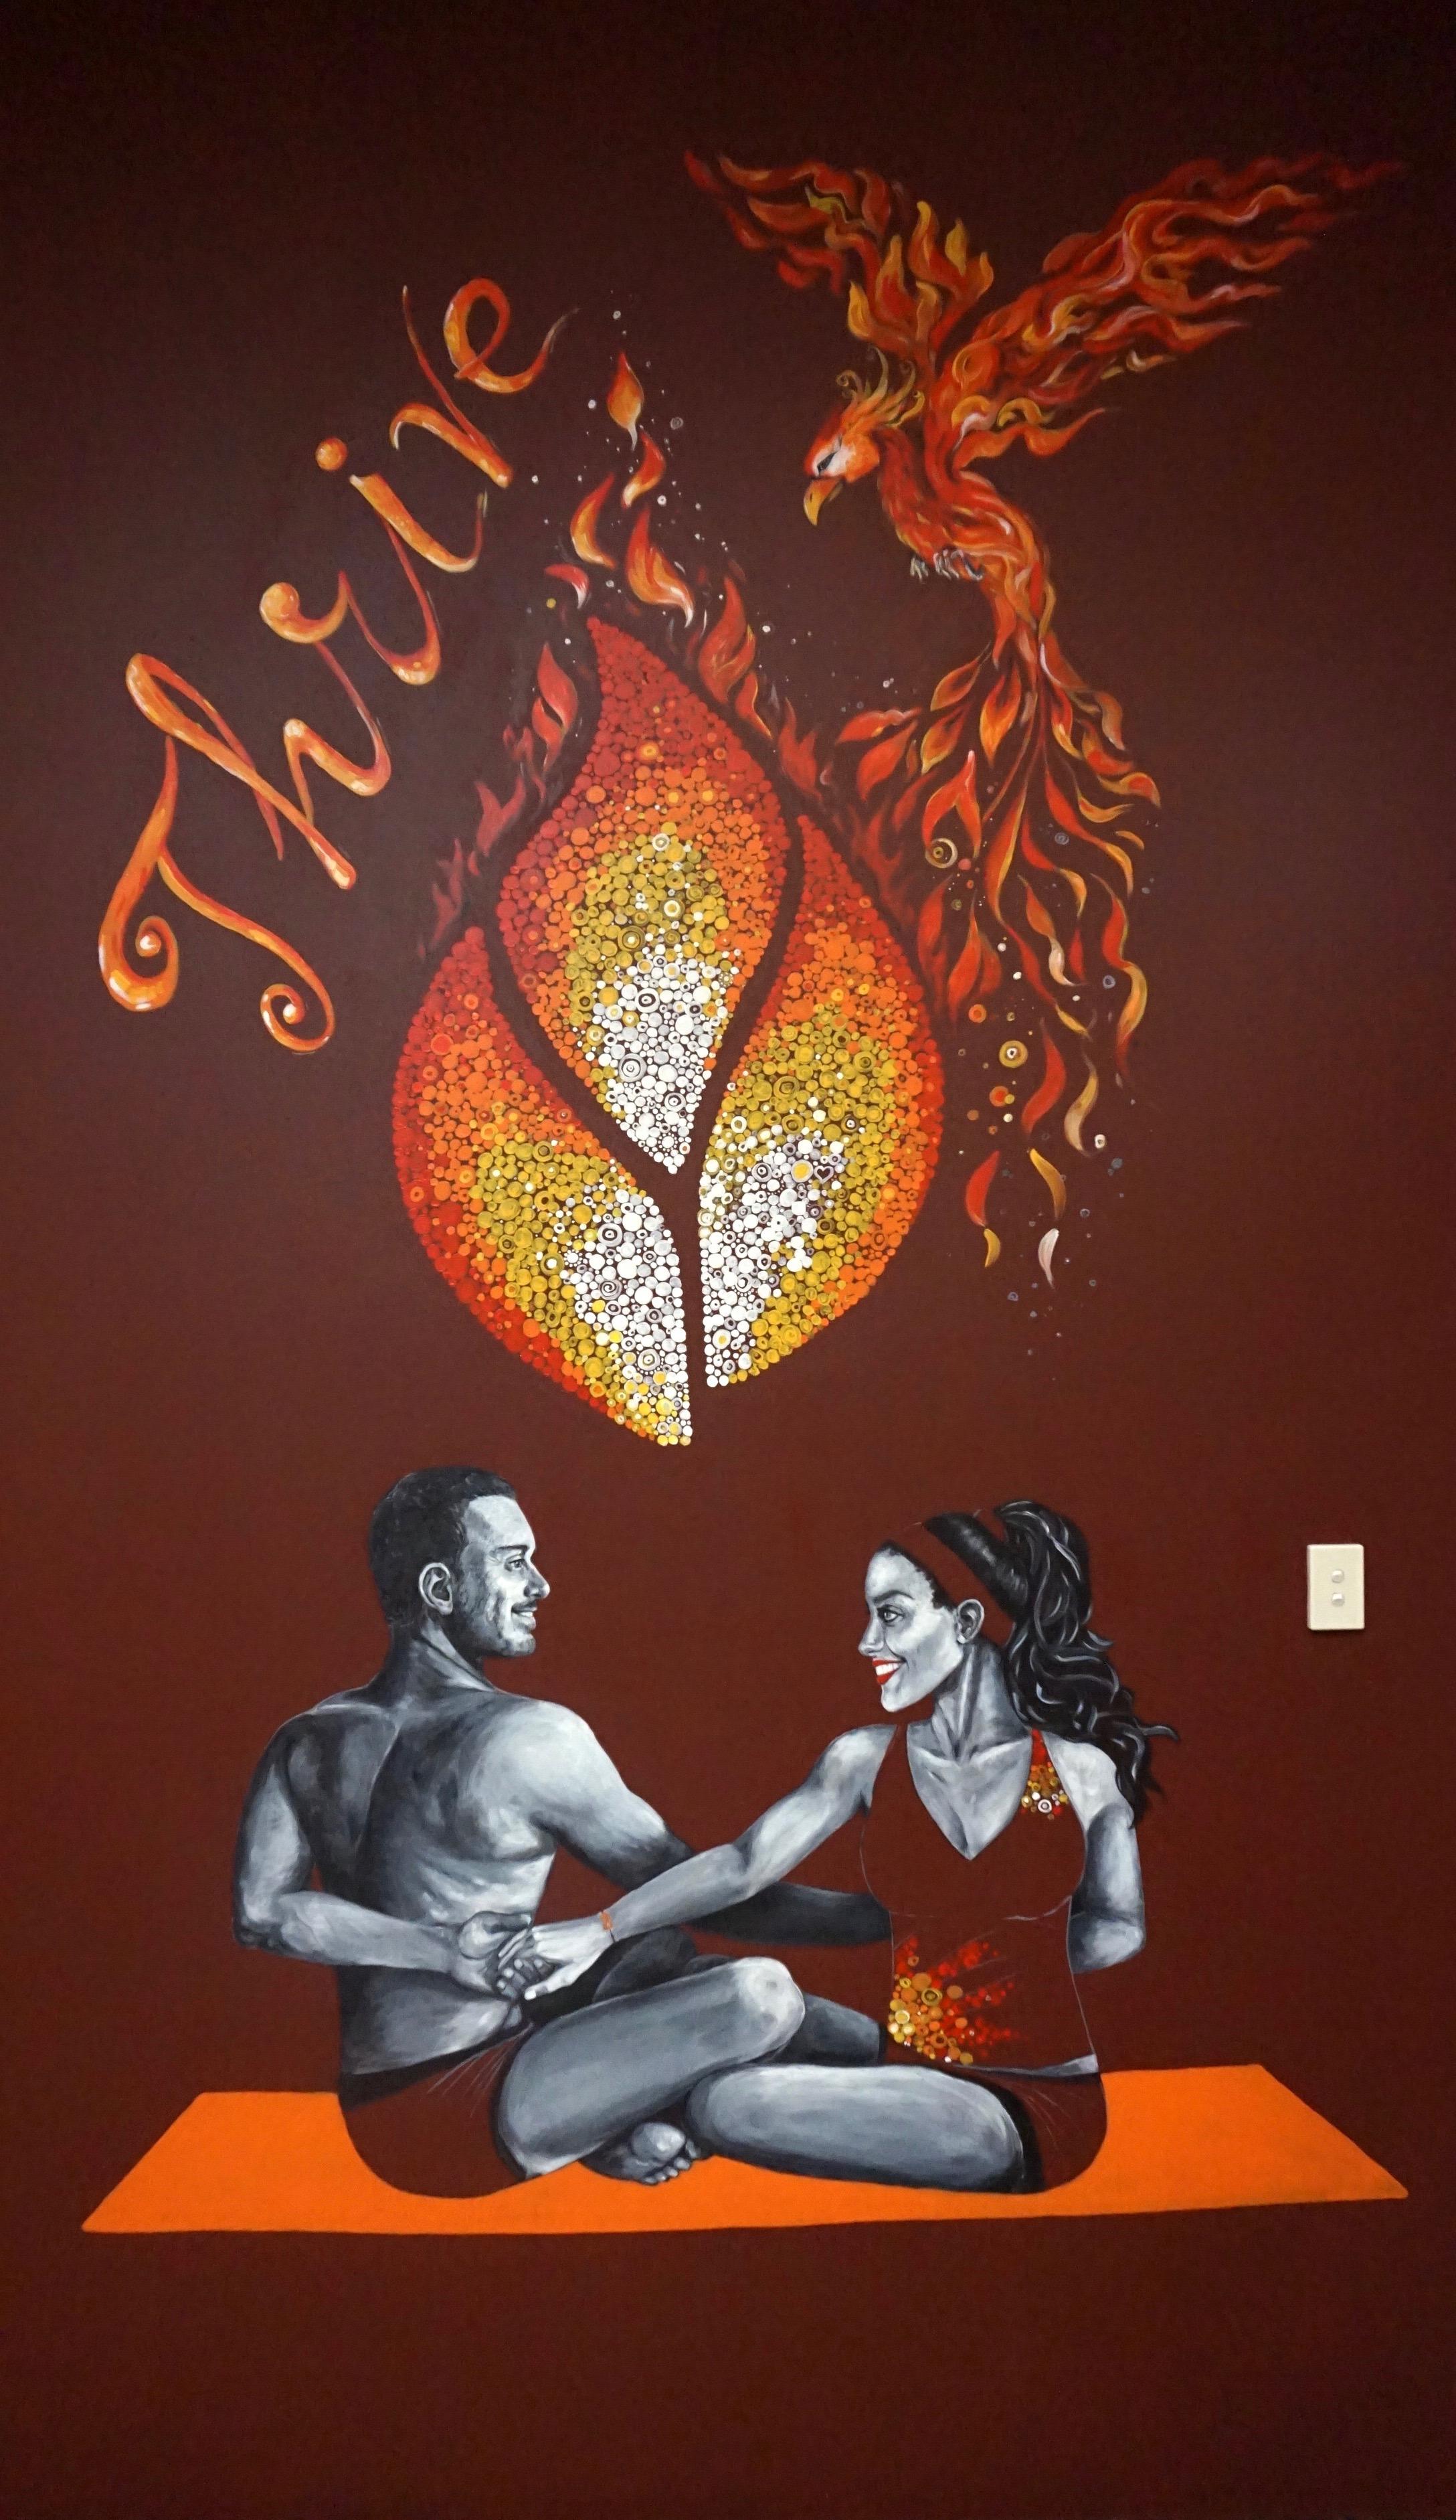 Bonfire Thrive - Kat's Mural Art